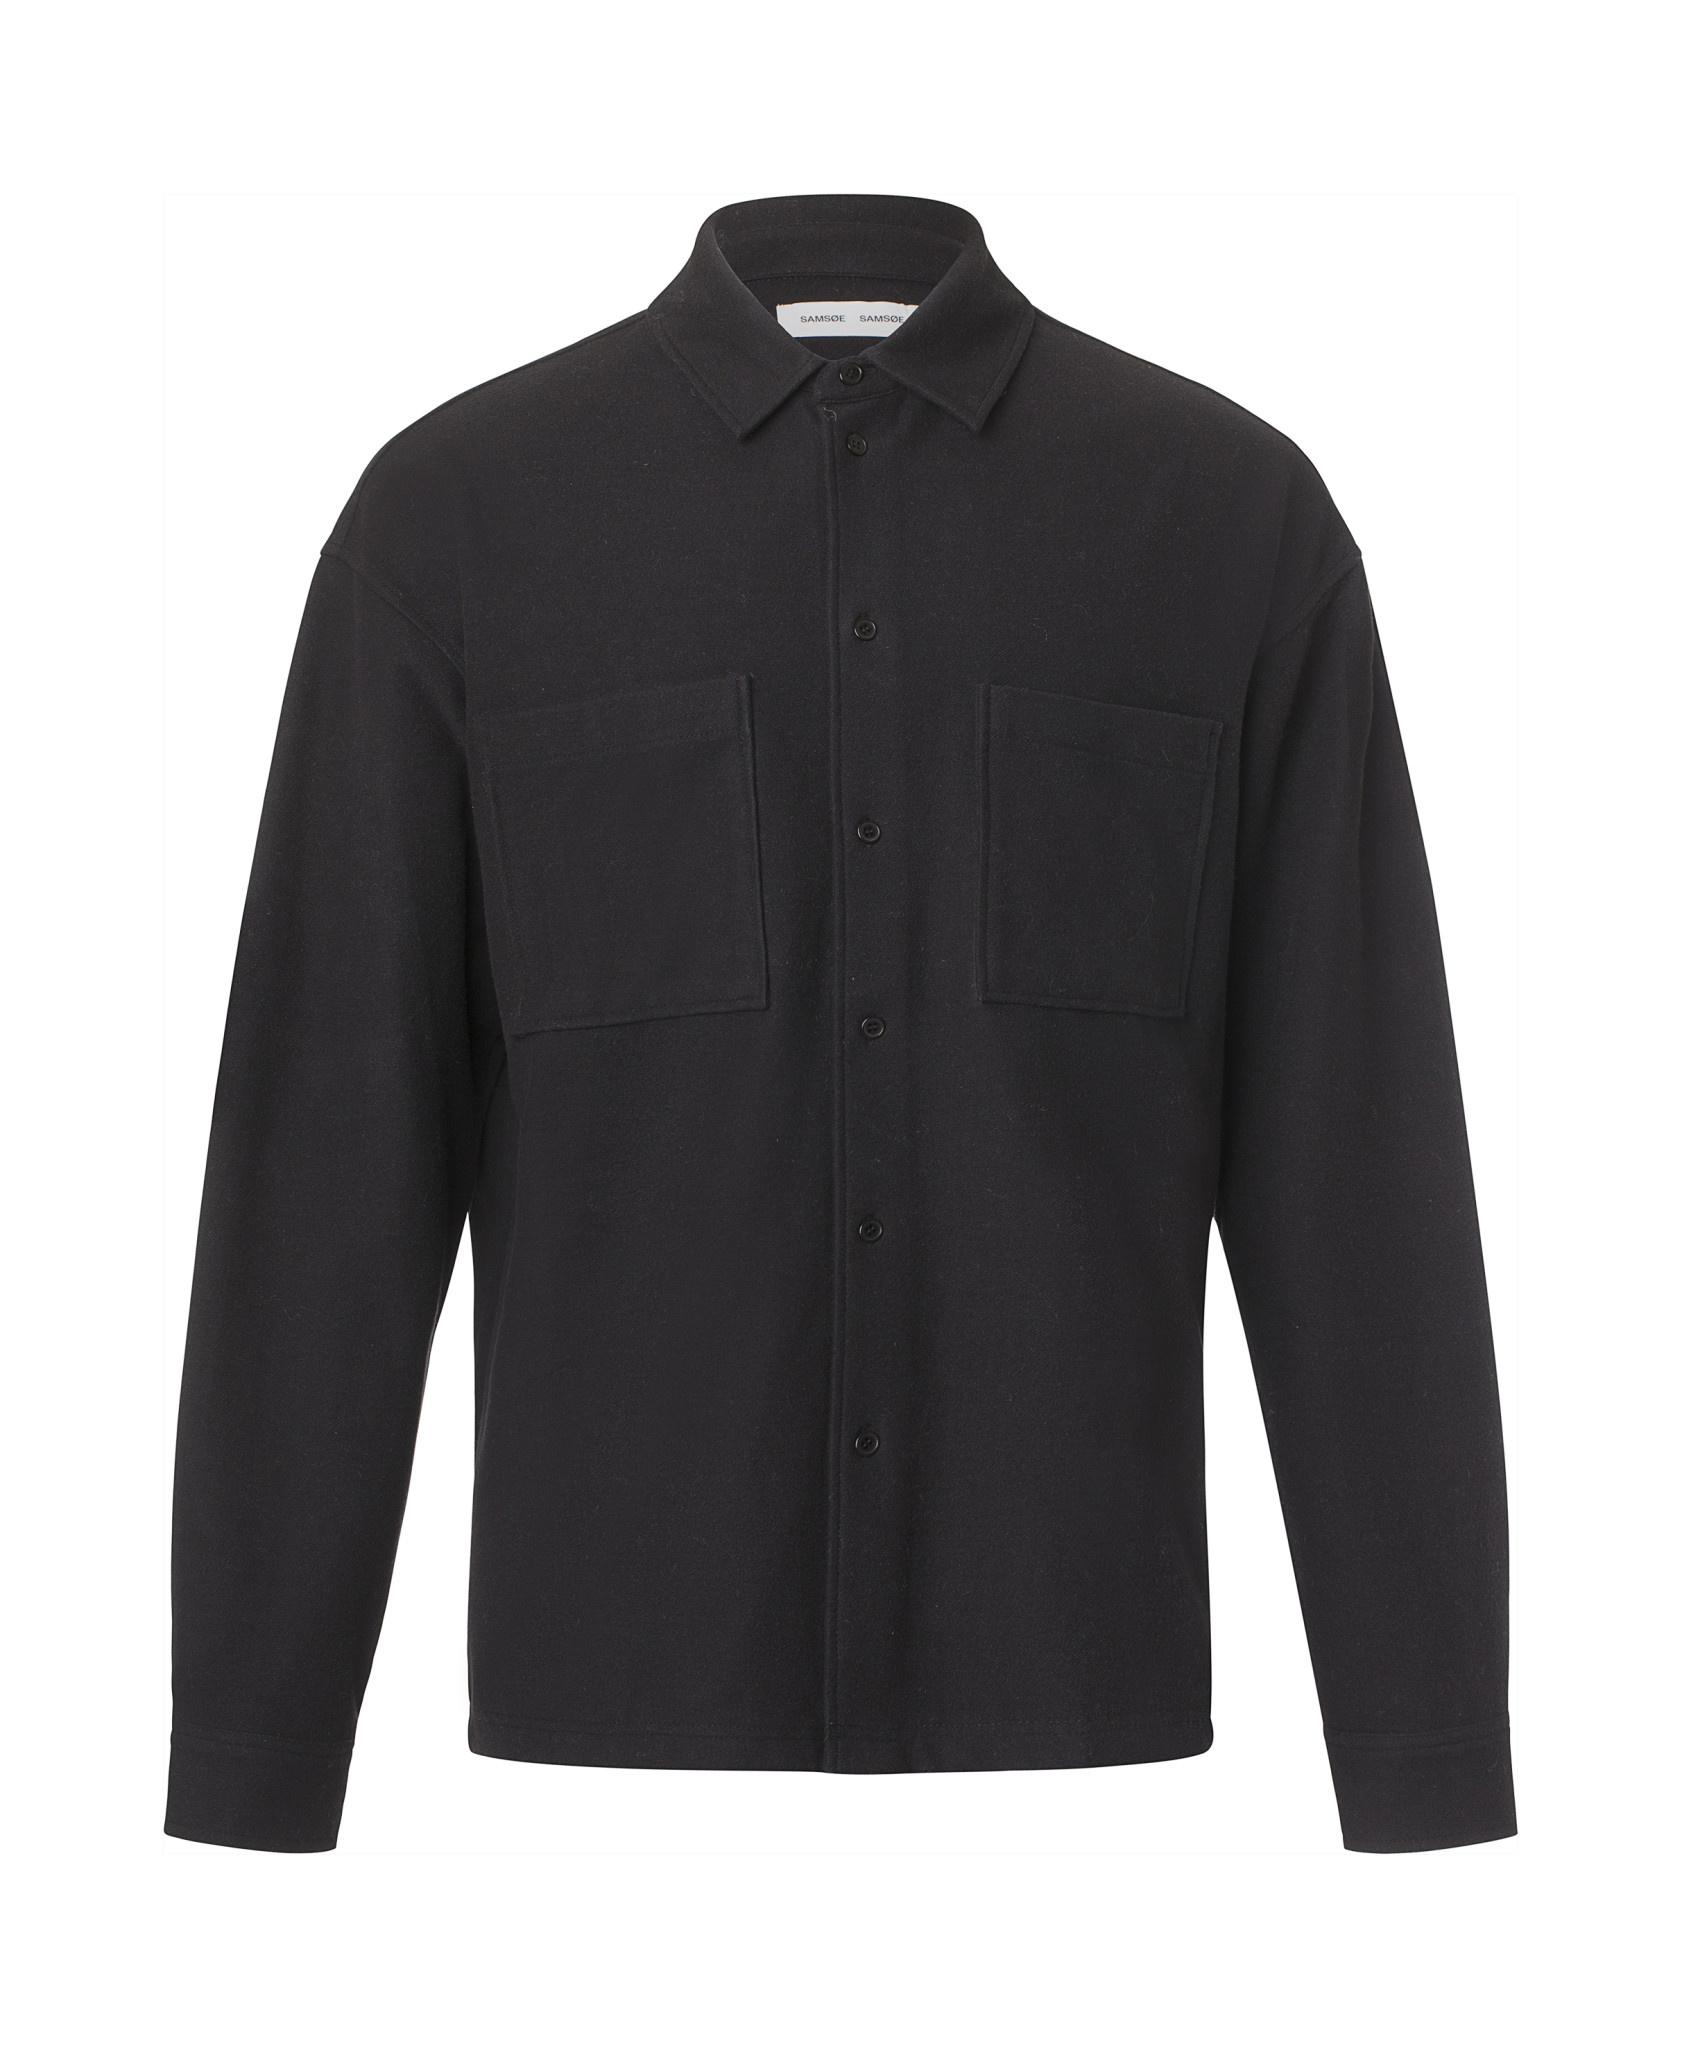 Poule Heavy Overshirt Black-1